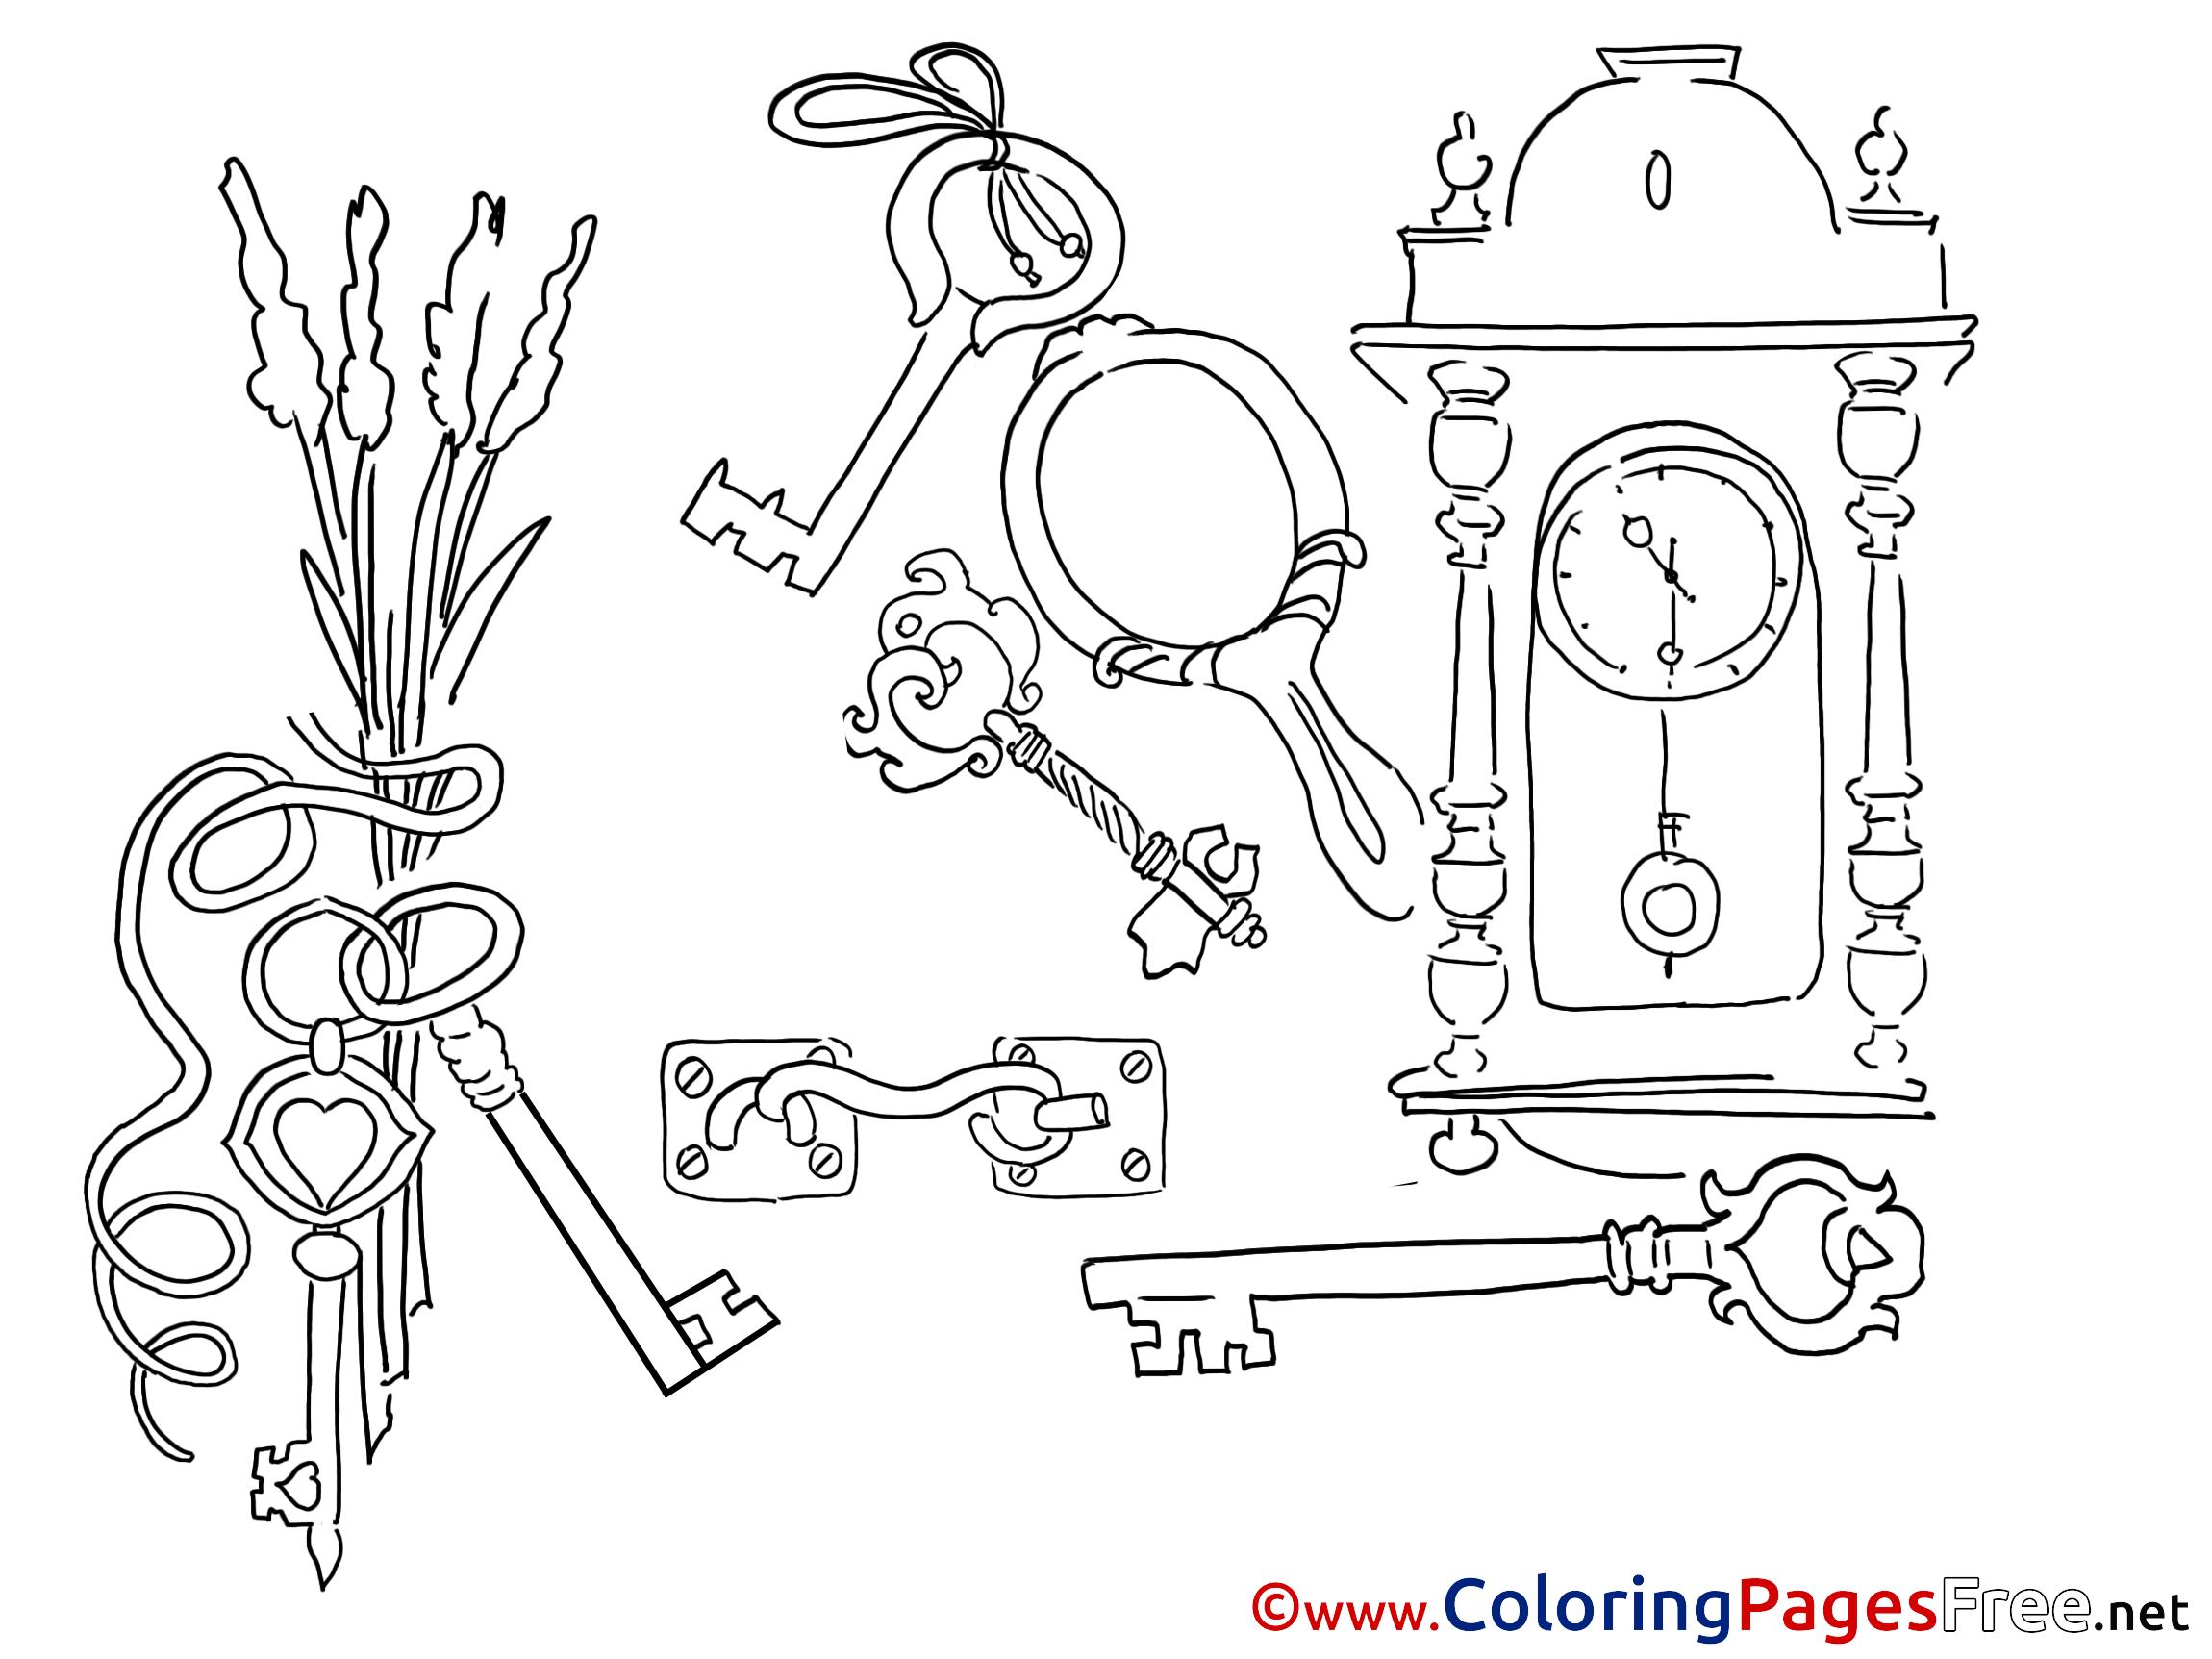 Free coloring pages keys - Free Coloring Pages Keys 15